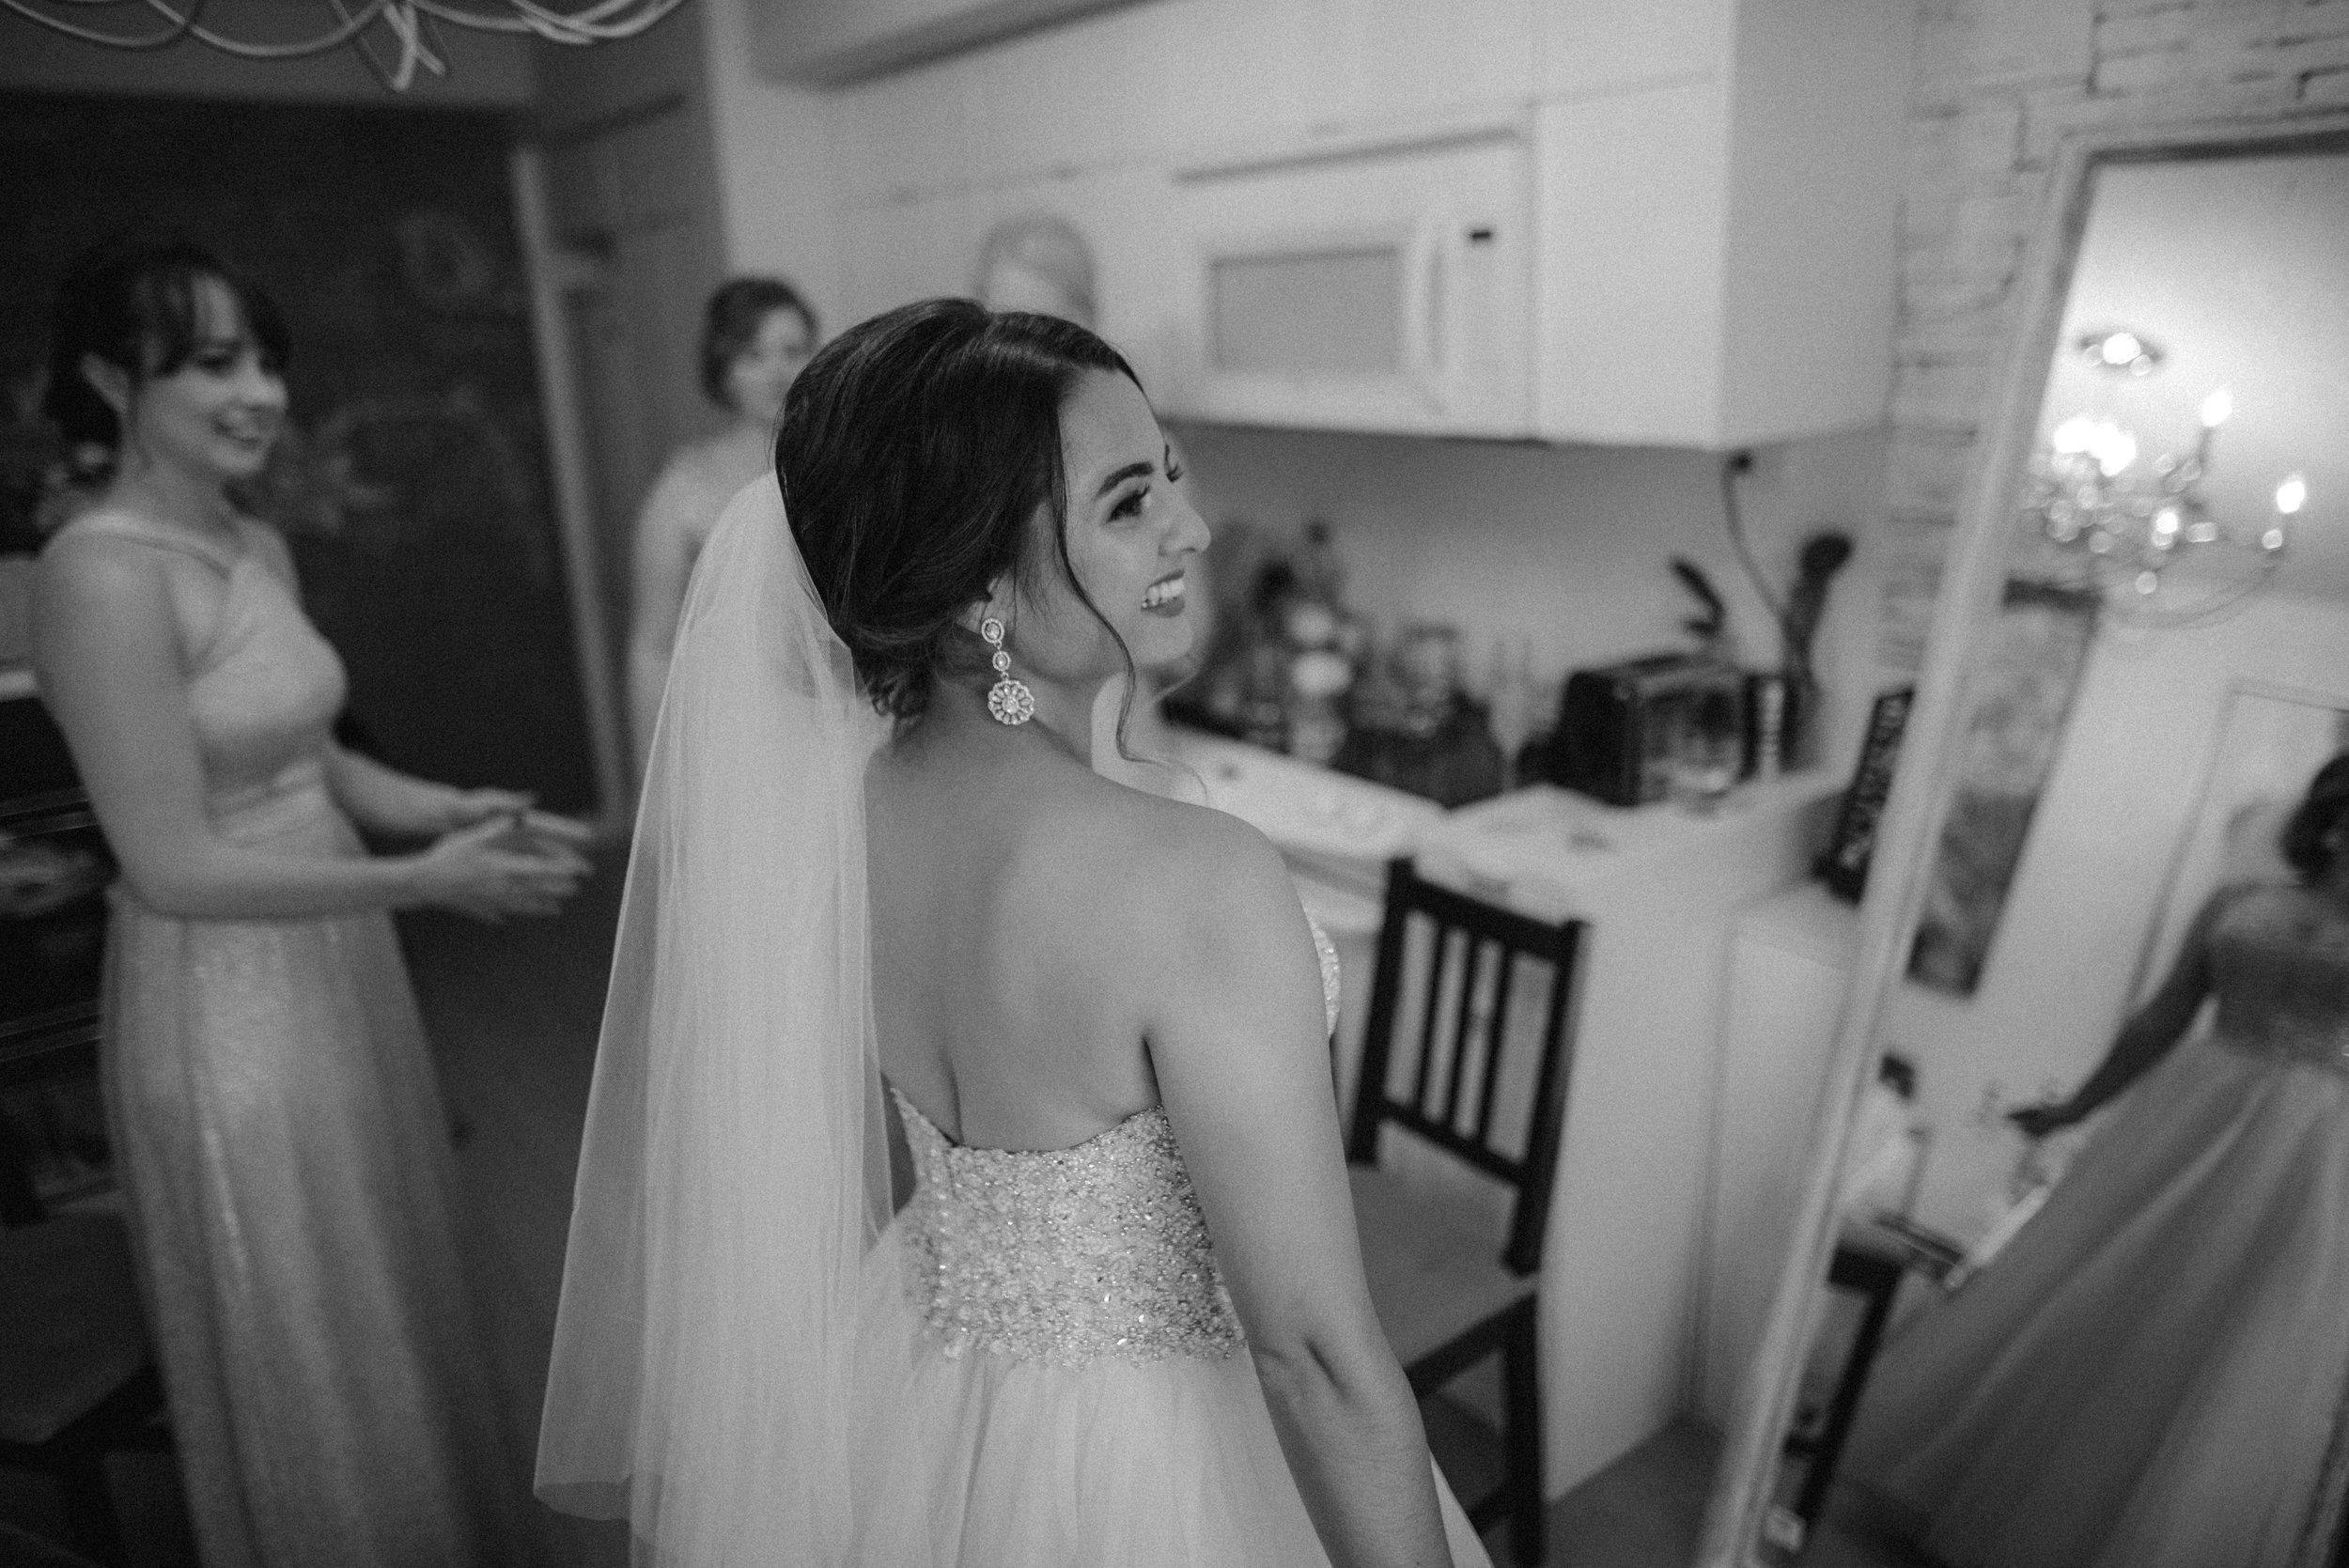 mariage_photographe_toronto_gatineau_ottawa_photographer_wedding-57.jpg